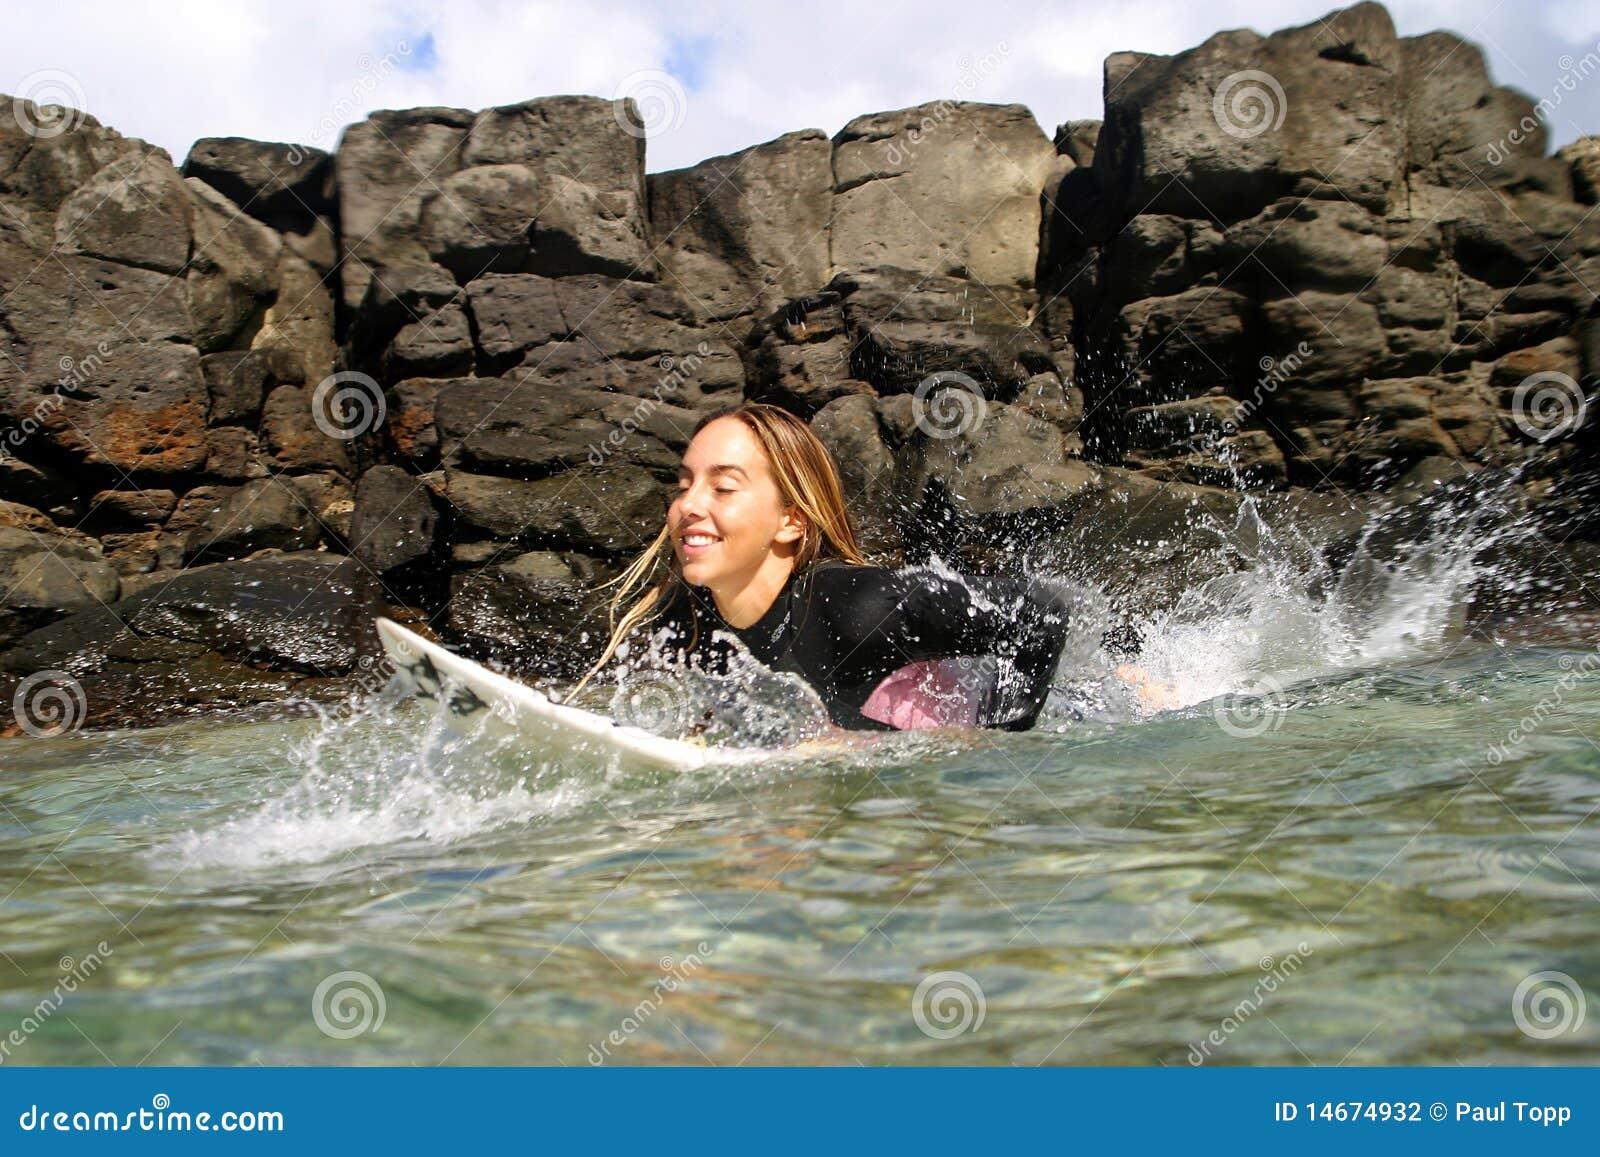 Professionele Vrouw Surfer Cecilia Enriquez